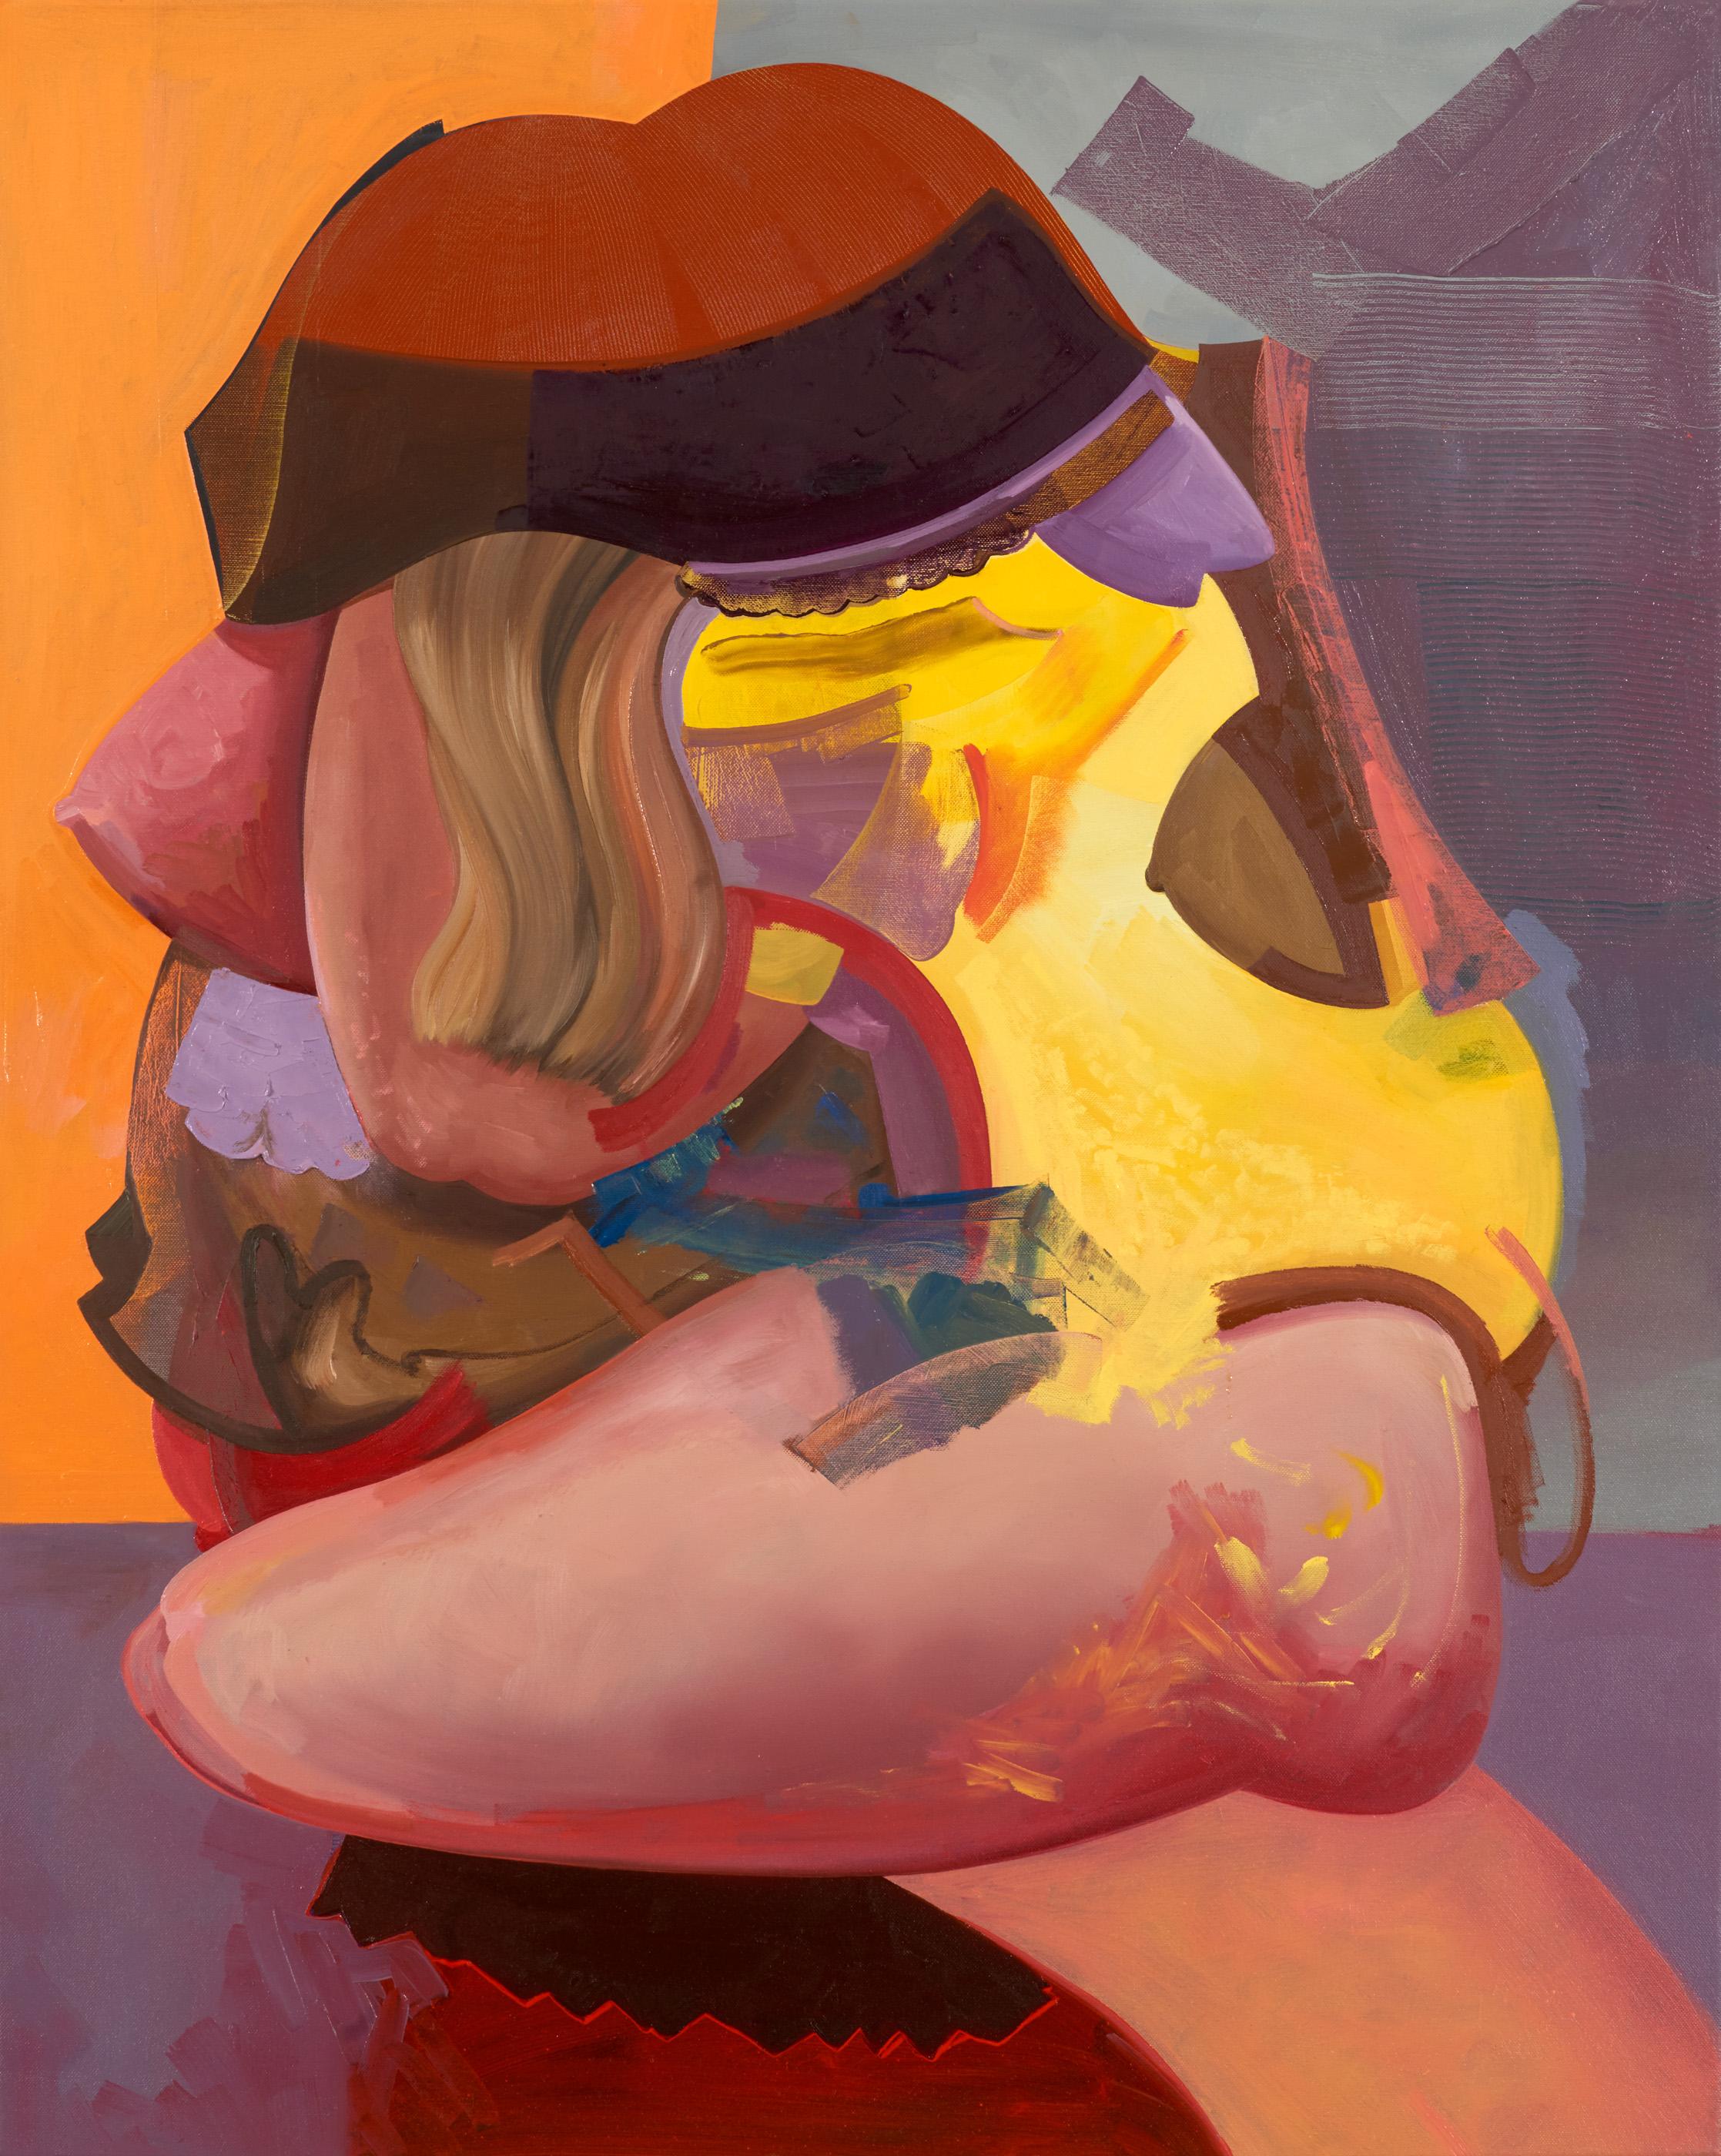 Egle otto, Malerei painting Öl auf Leinwand oil on painting contemporary art contemporary artist Gegenwartskunst Künstlerin female artist female art gender Oil on canvas body